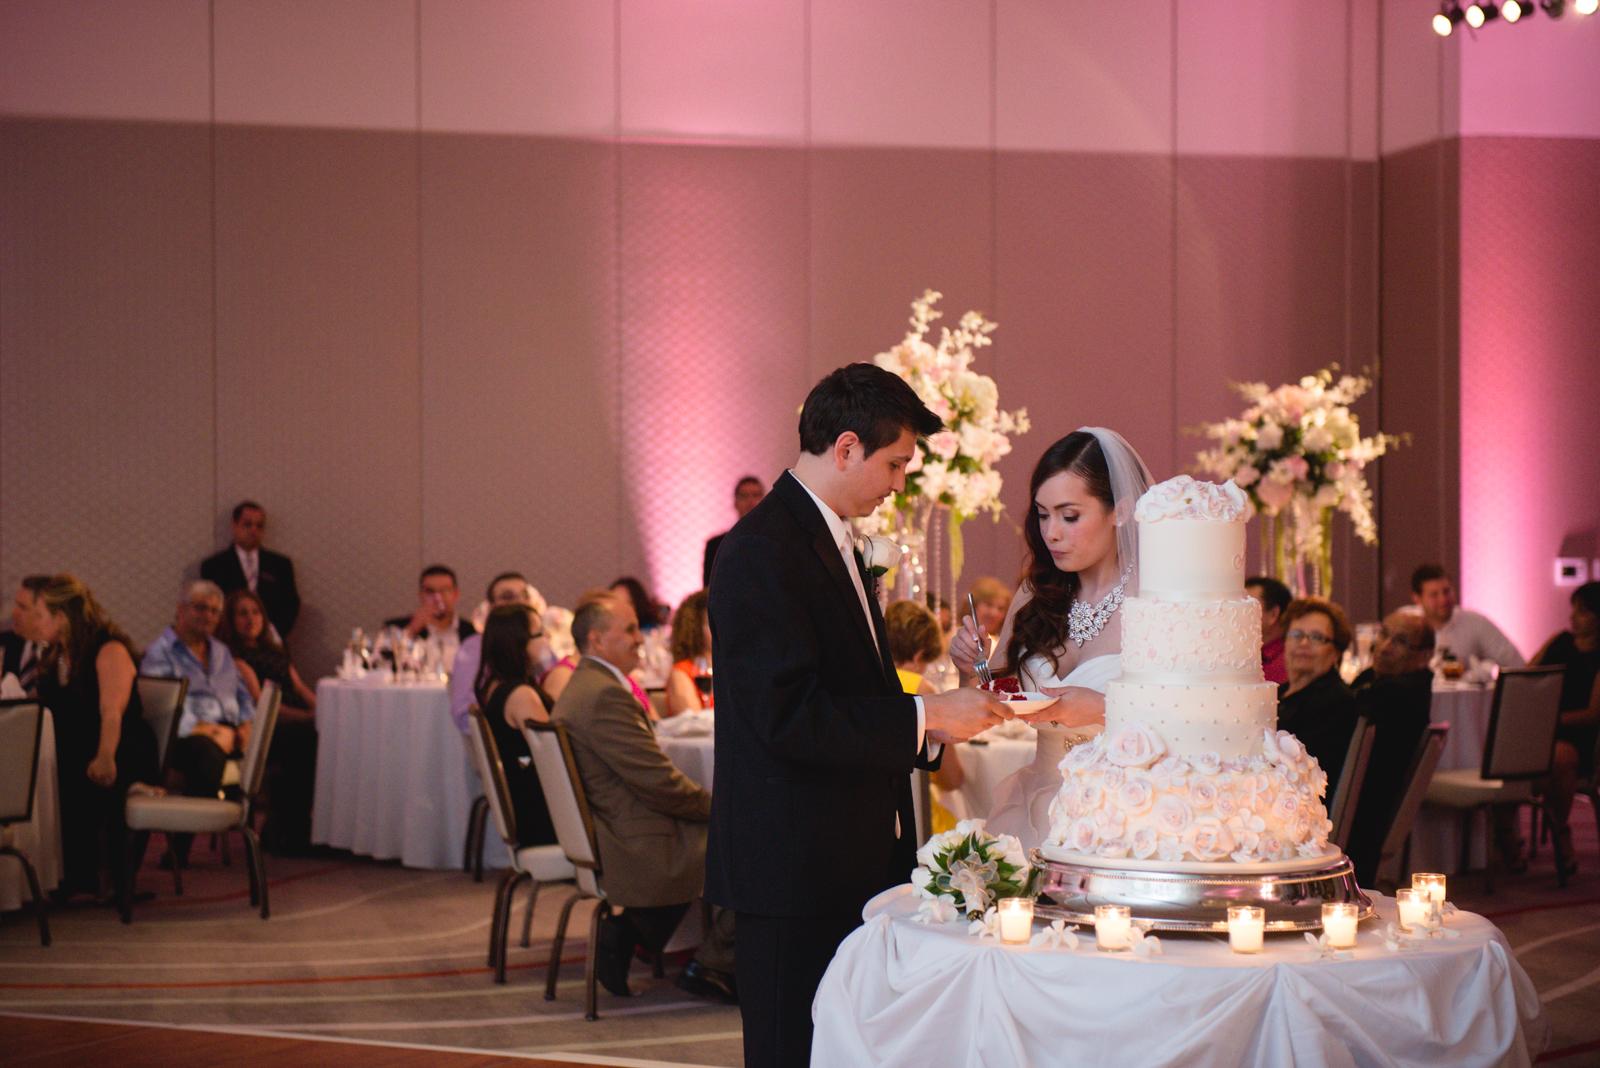 20130802-Jessica & Alex's Wedding-212-BlogEdit.JPG